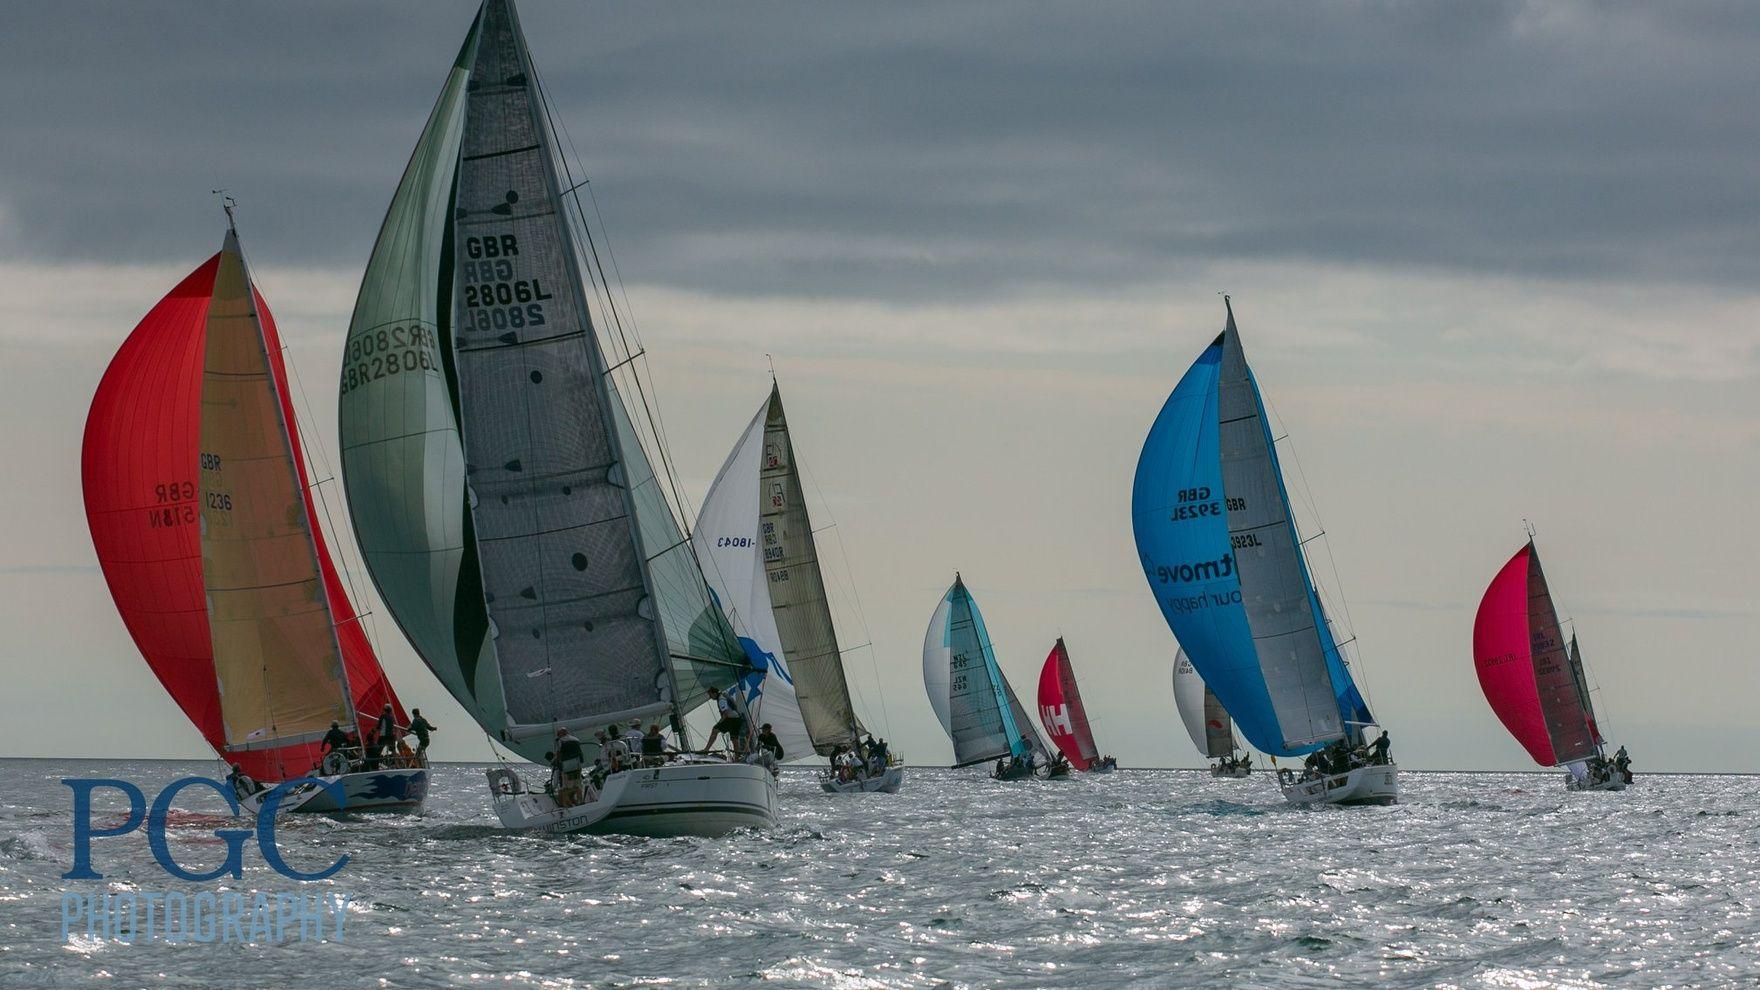 Dartmouth Royal Regatta Sailing Week 2021